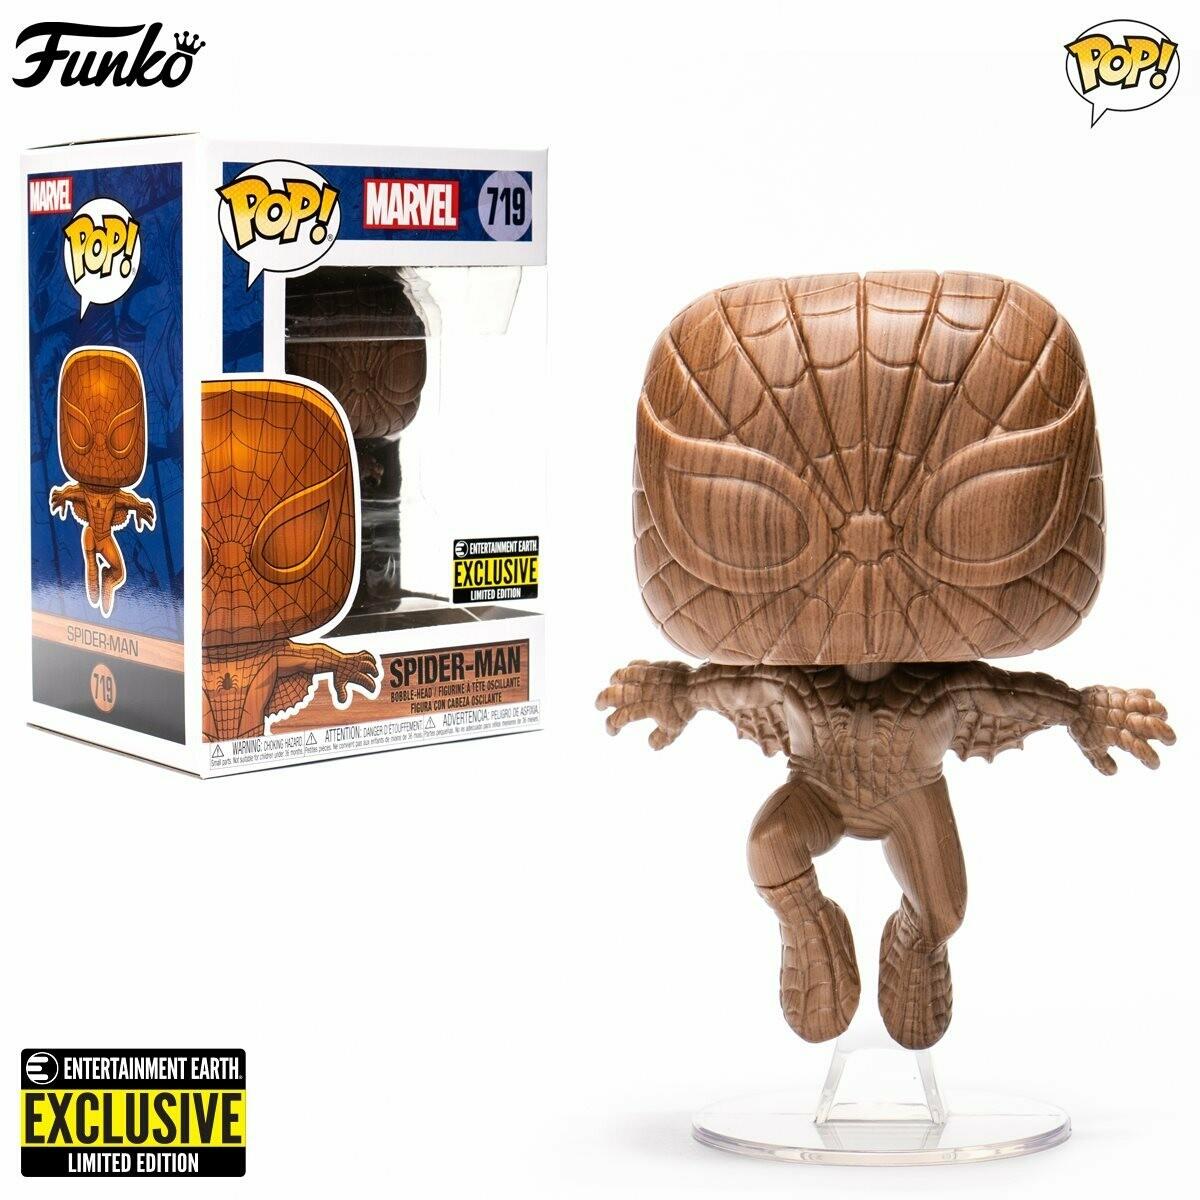 Funko Marvel - Spider-man Wood Deco Entertainment Earth Exclusive Pop! Vinyl Figure